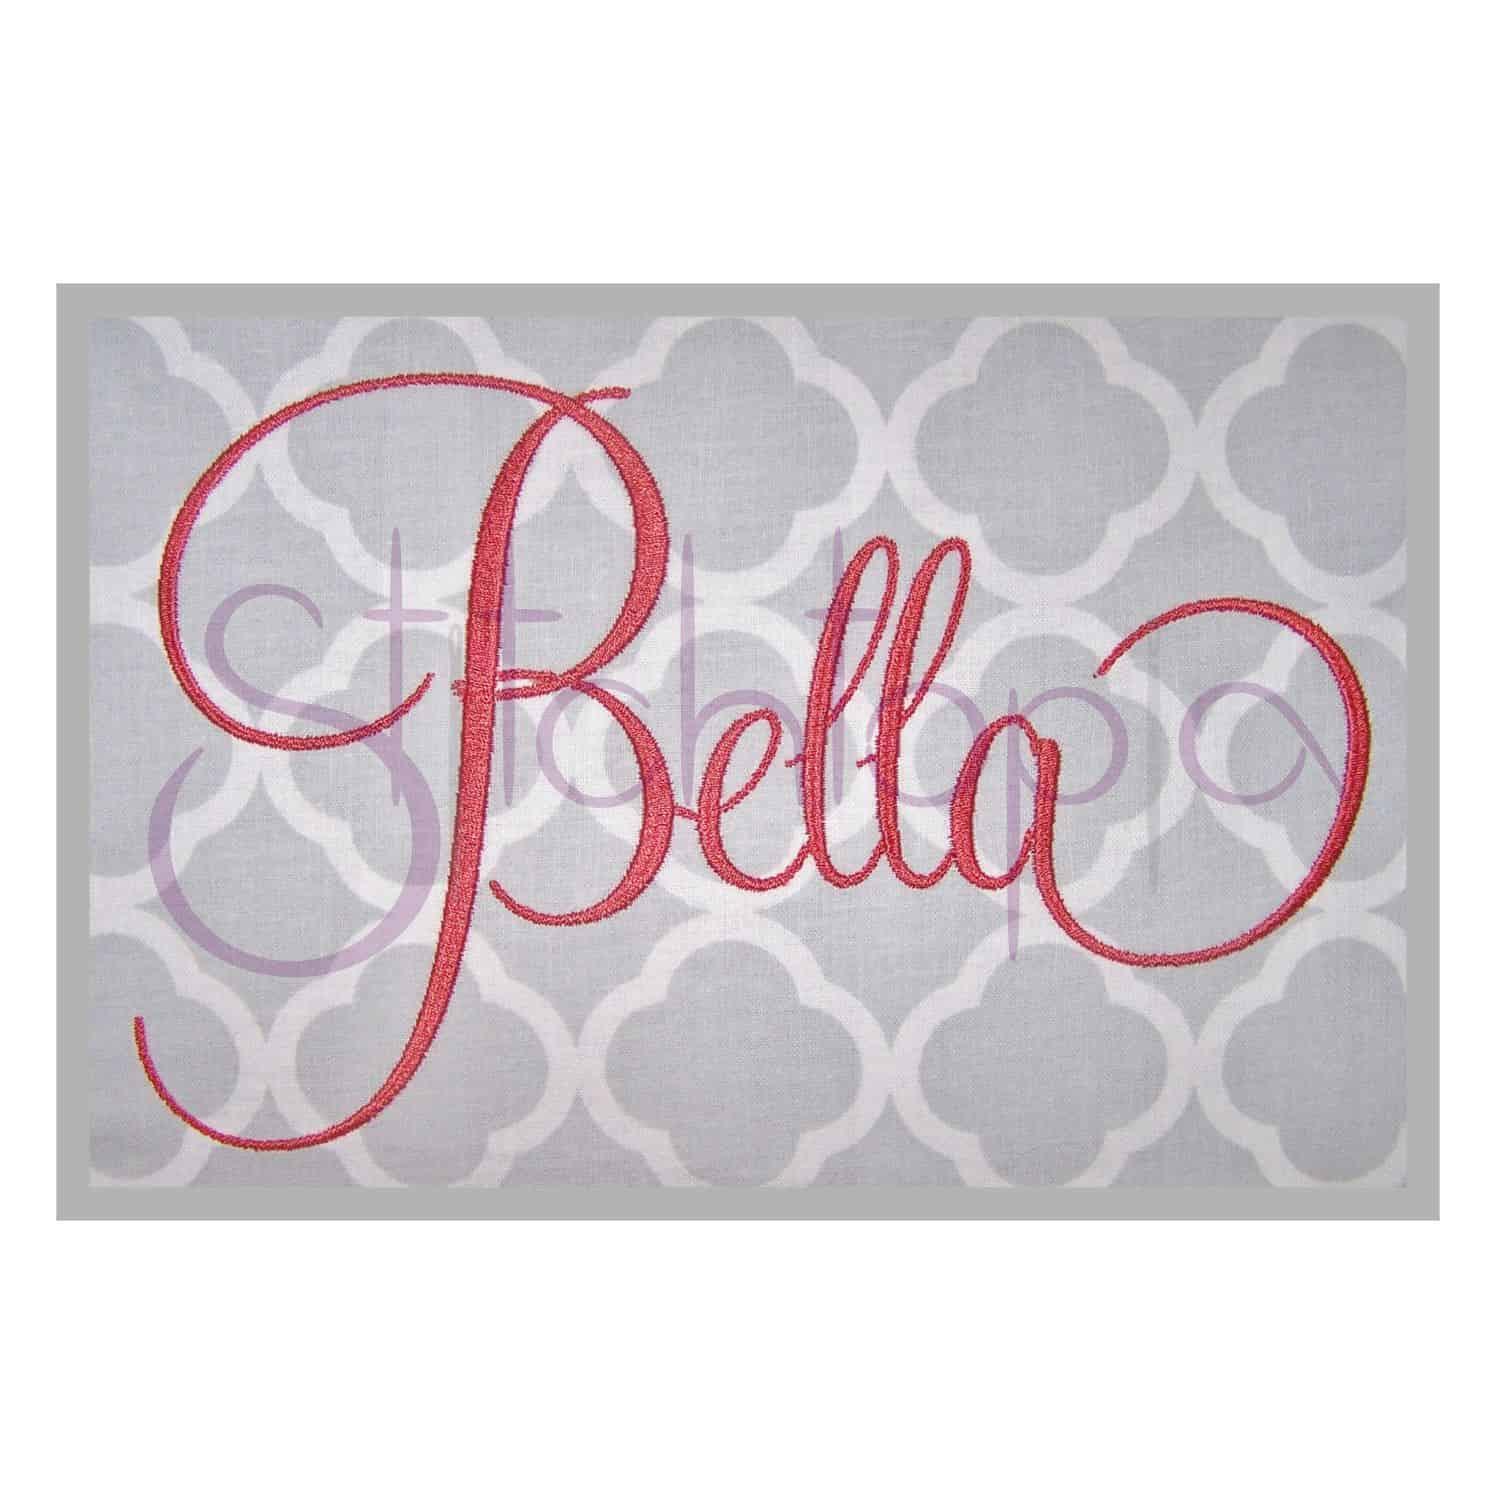 Bella Embroidery Font Set - 5